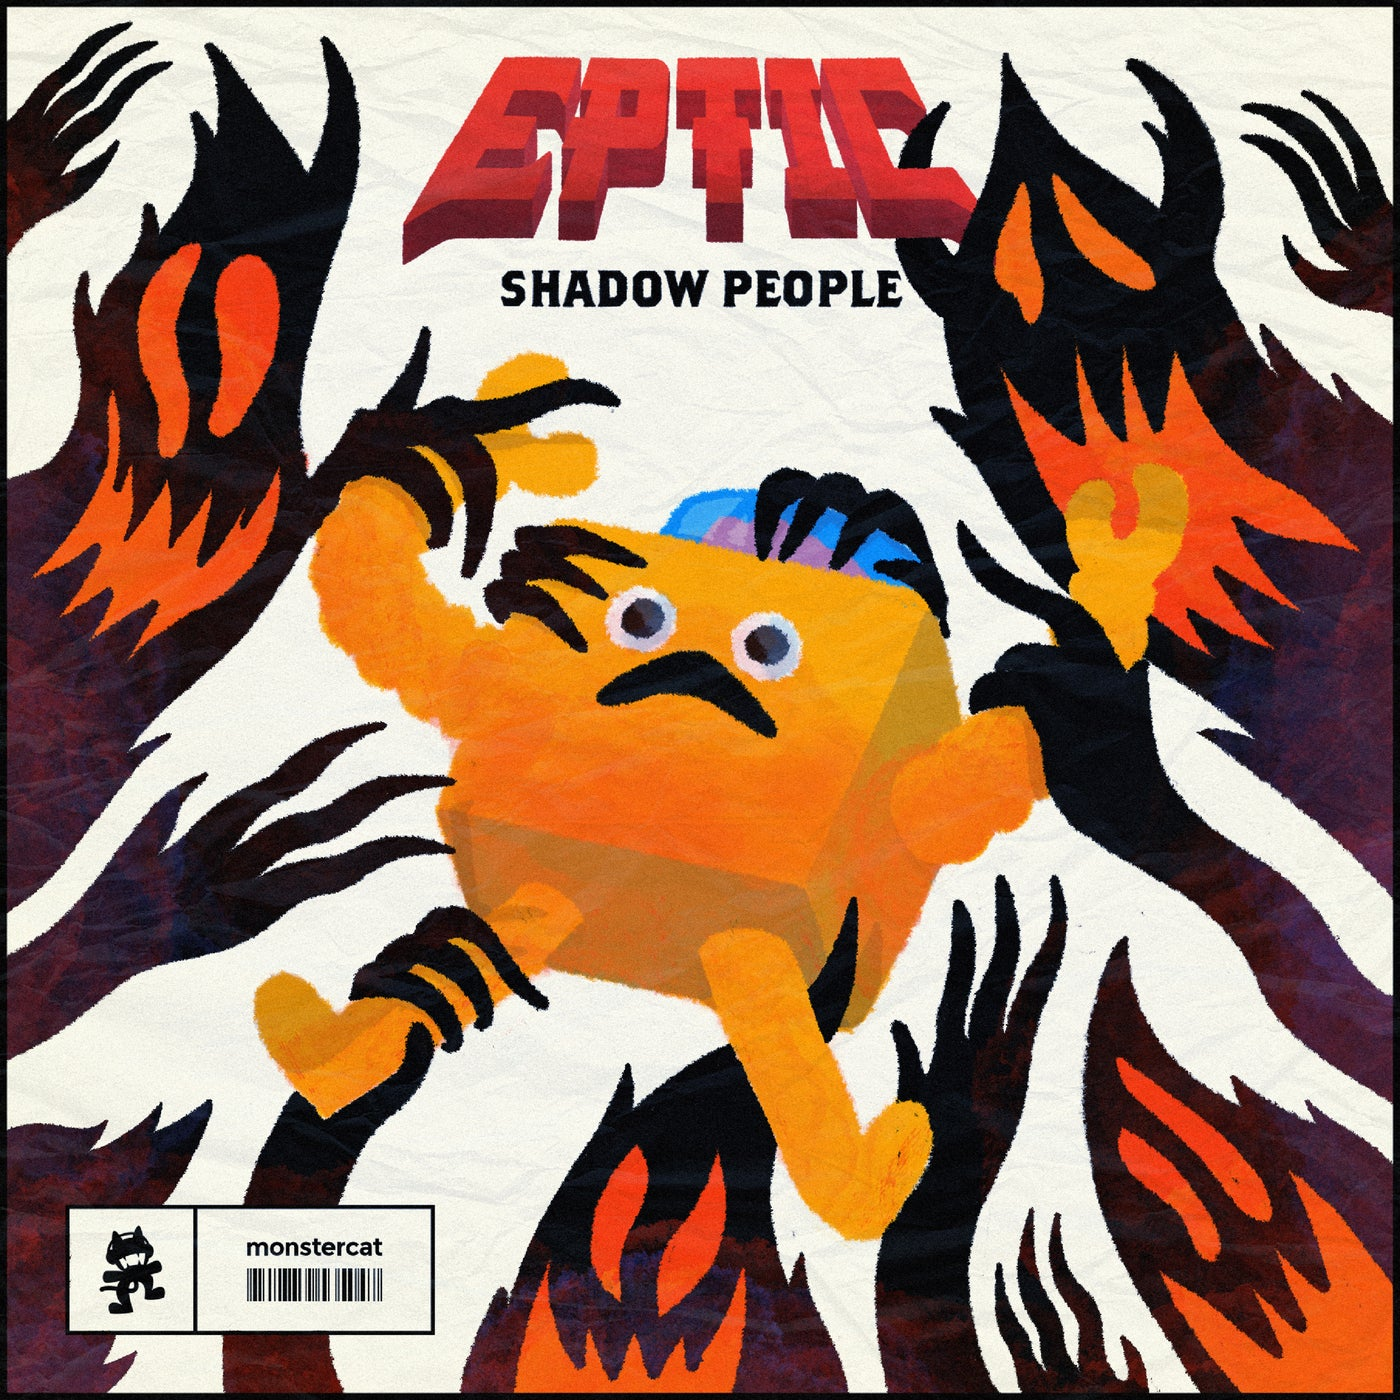 Shadow People (Original Mix)